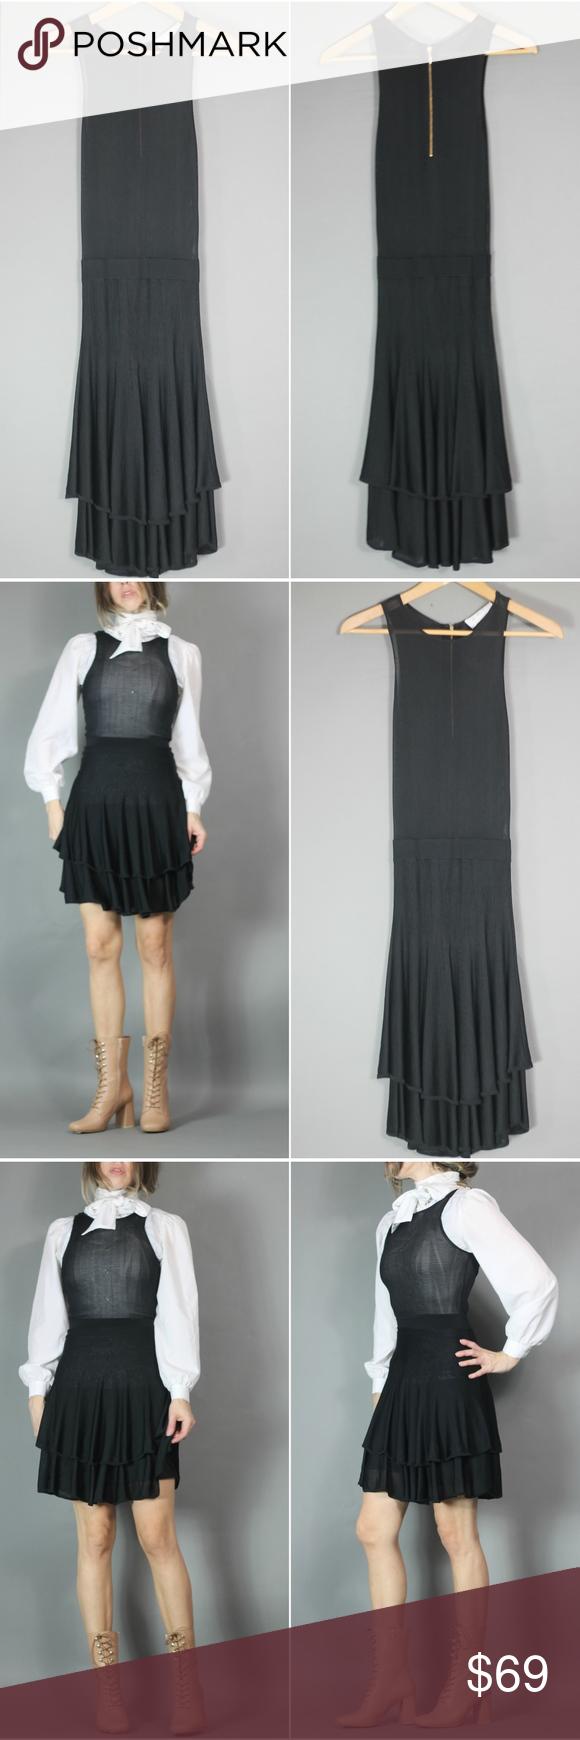 Alc black sheer knit dress gorgeous sheer ruffle dress by alc